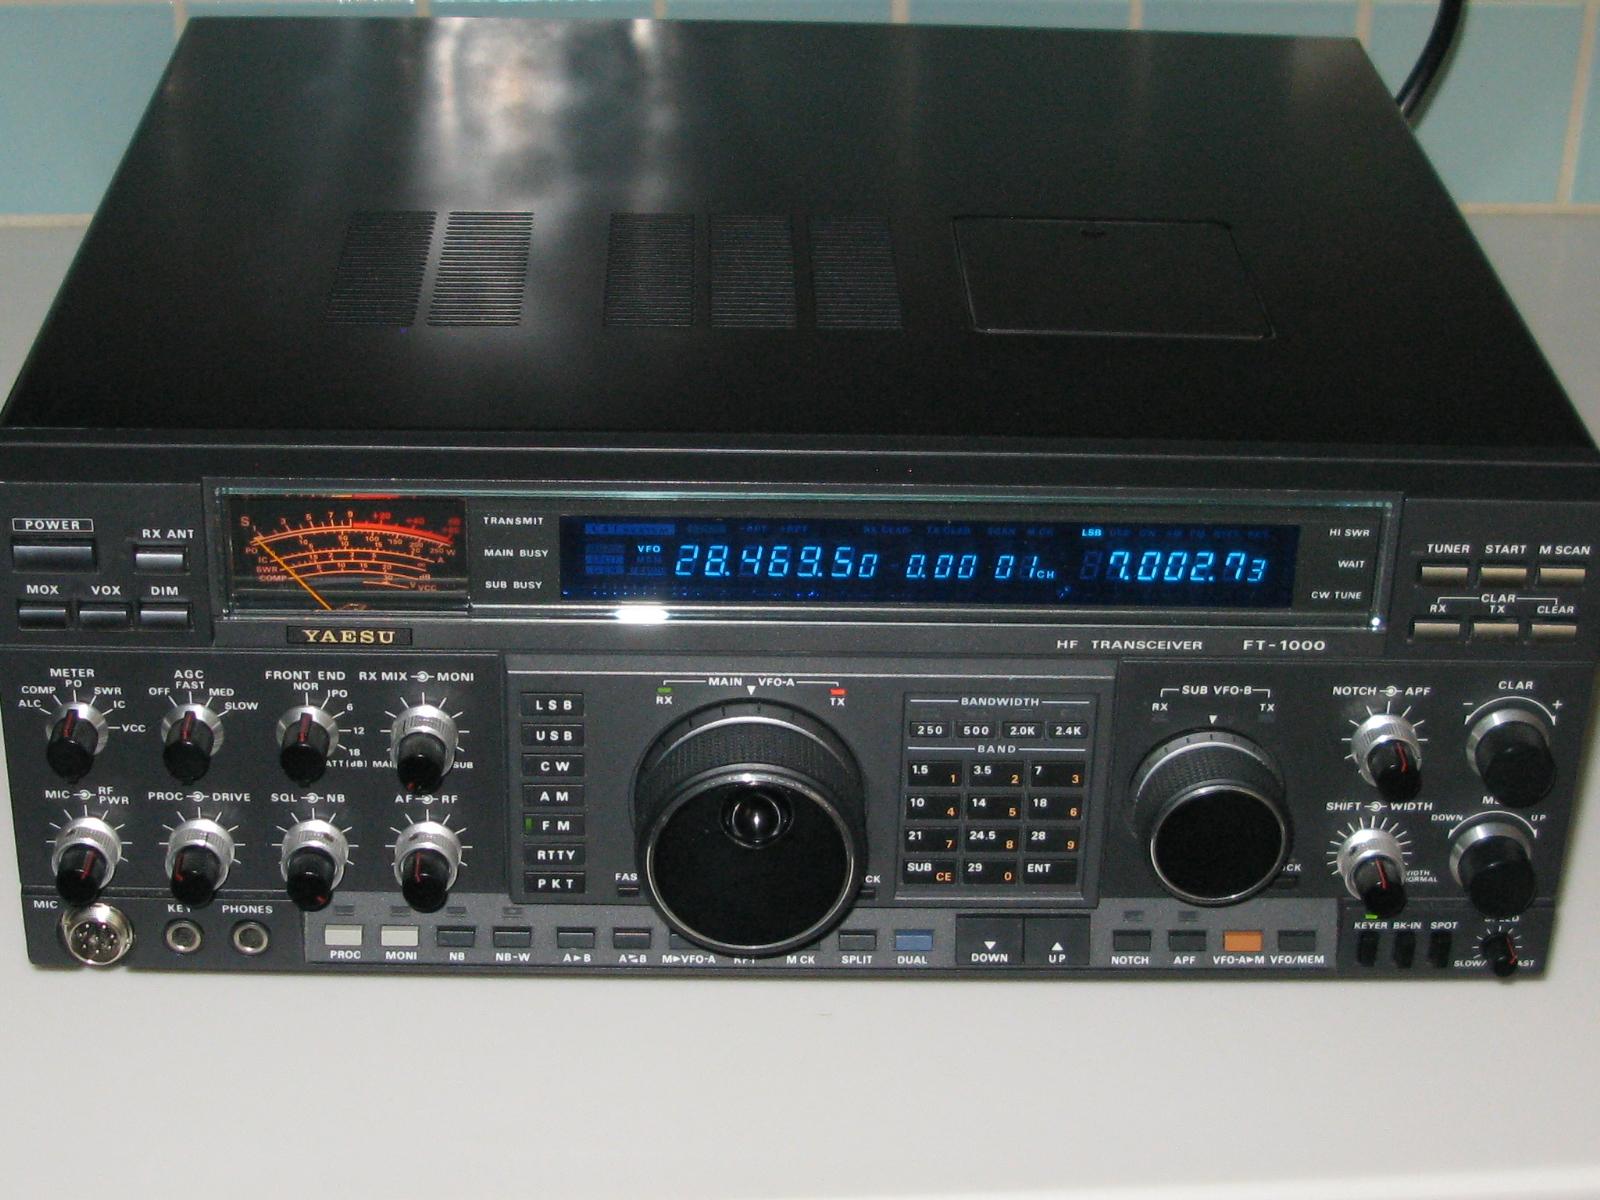 FT-1000D blue display 003 (1).JPG